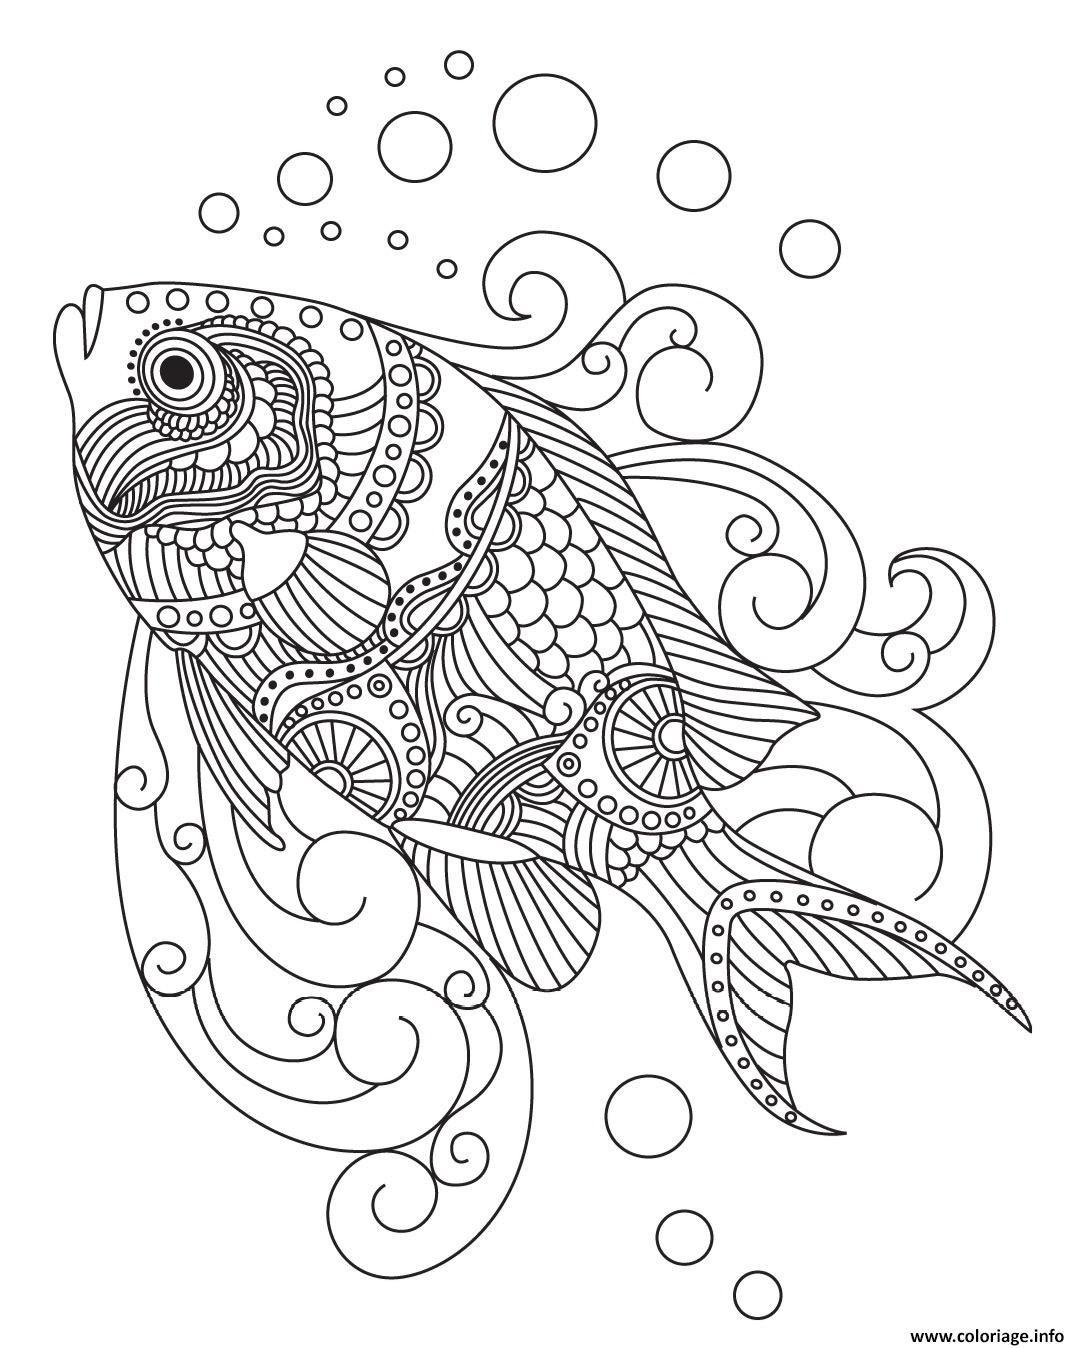 Coloriage Mandala Poisson Bondless